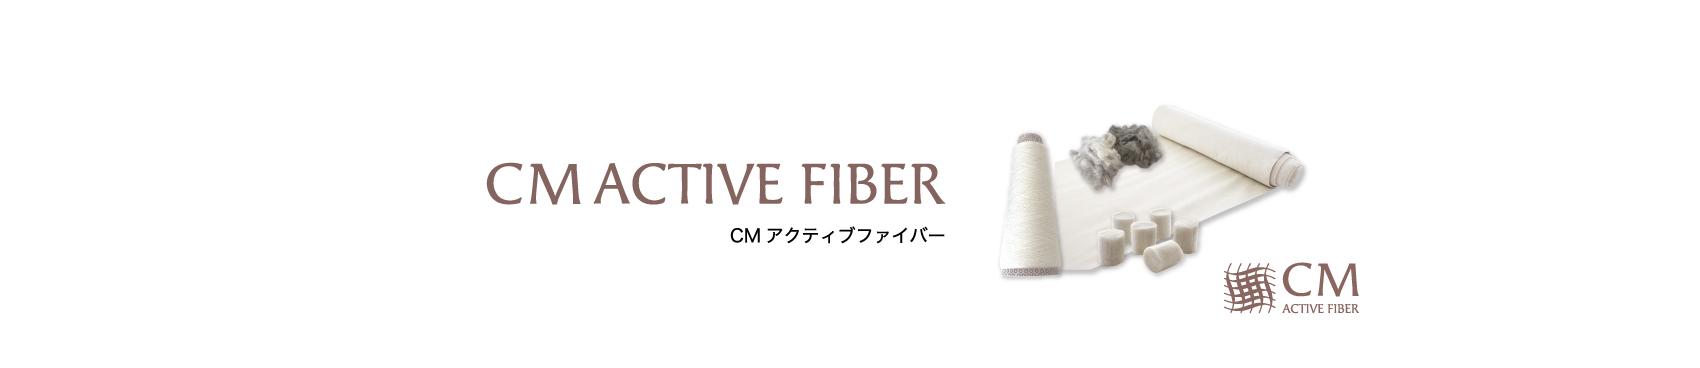 CM ACTIVE FIBER